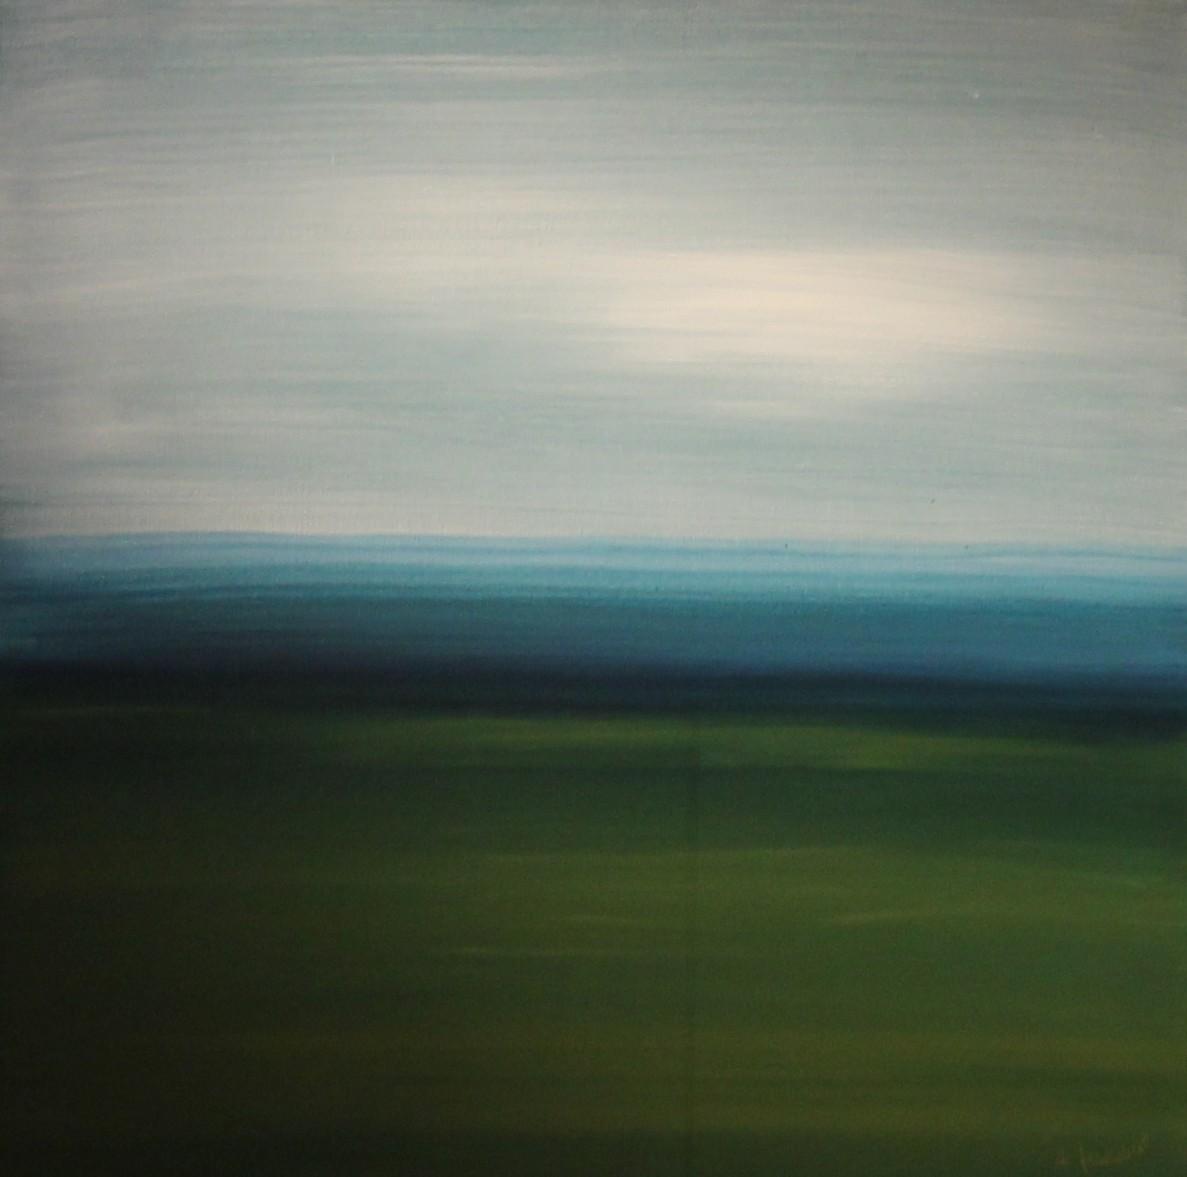 Kein Weg II,  60 x 60 Leinwand, Acryl